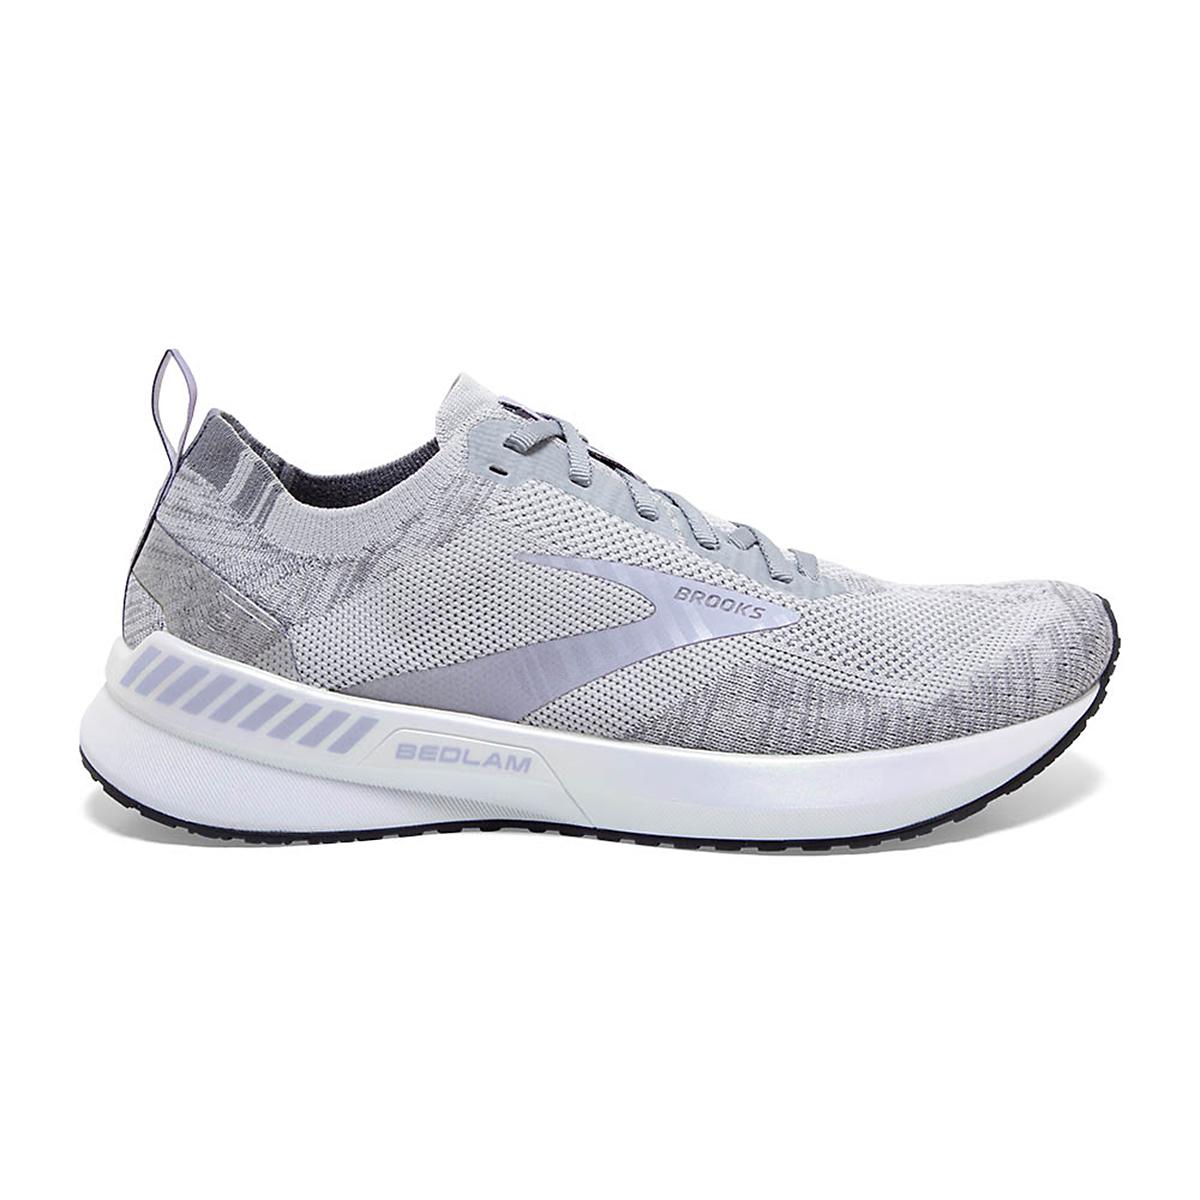 Women's Brooks Bedlam 3 Running Shoe - Color: Oyster/Purple Heather - Size: 5 - Width: Regular, Oyster/Purple Heather, large, image 1